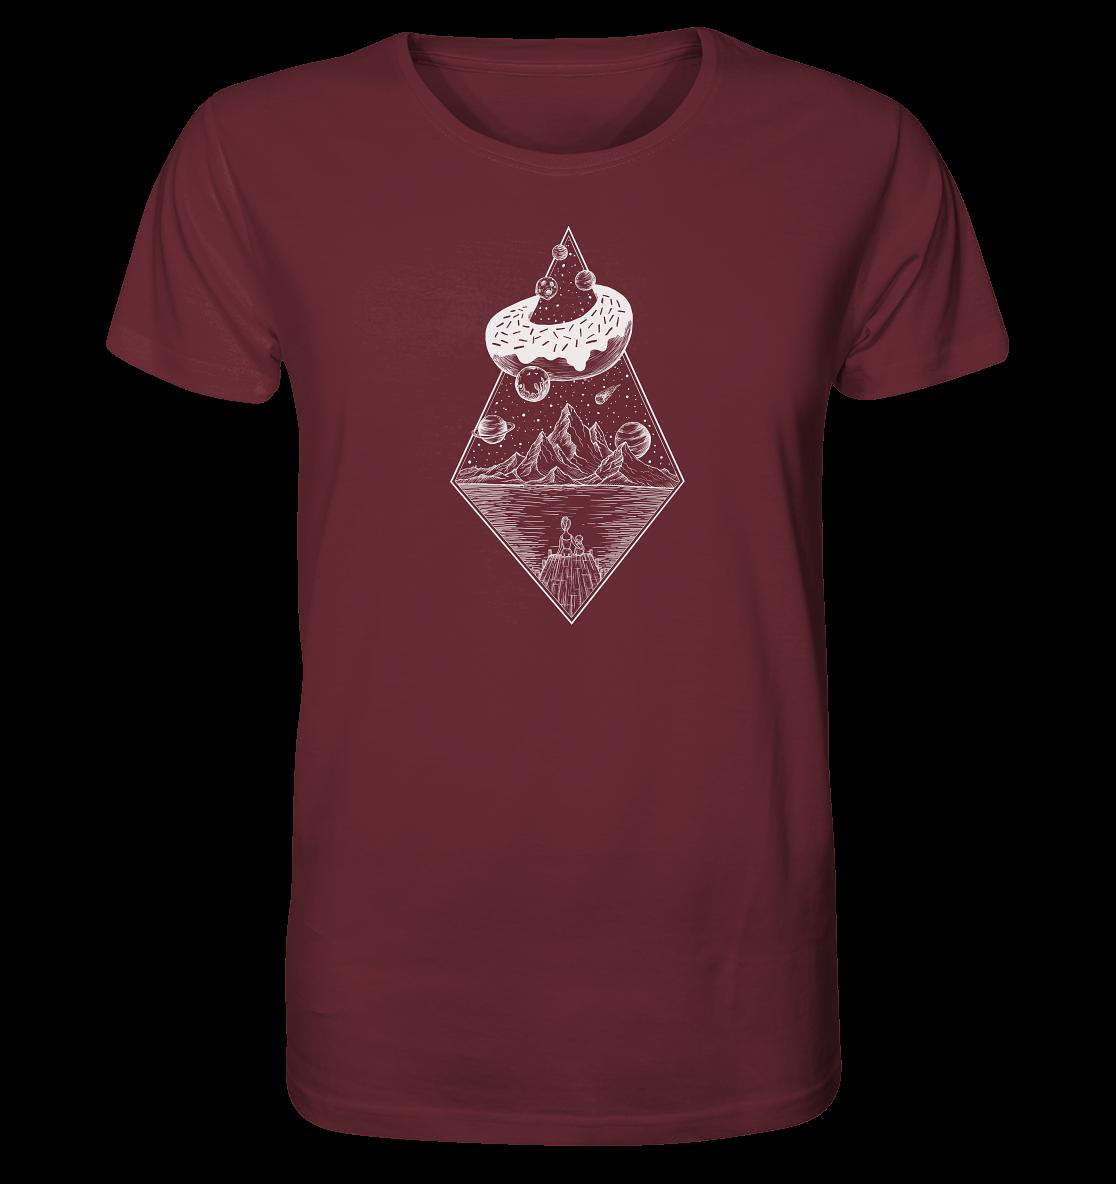 front-organic-shirt-672b34-1116x-1.png